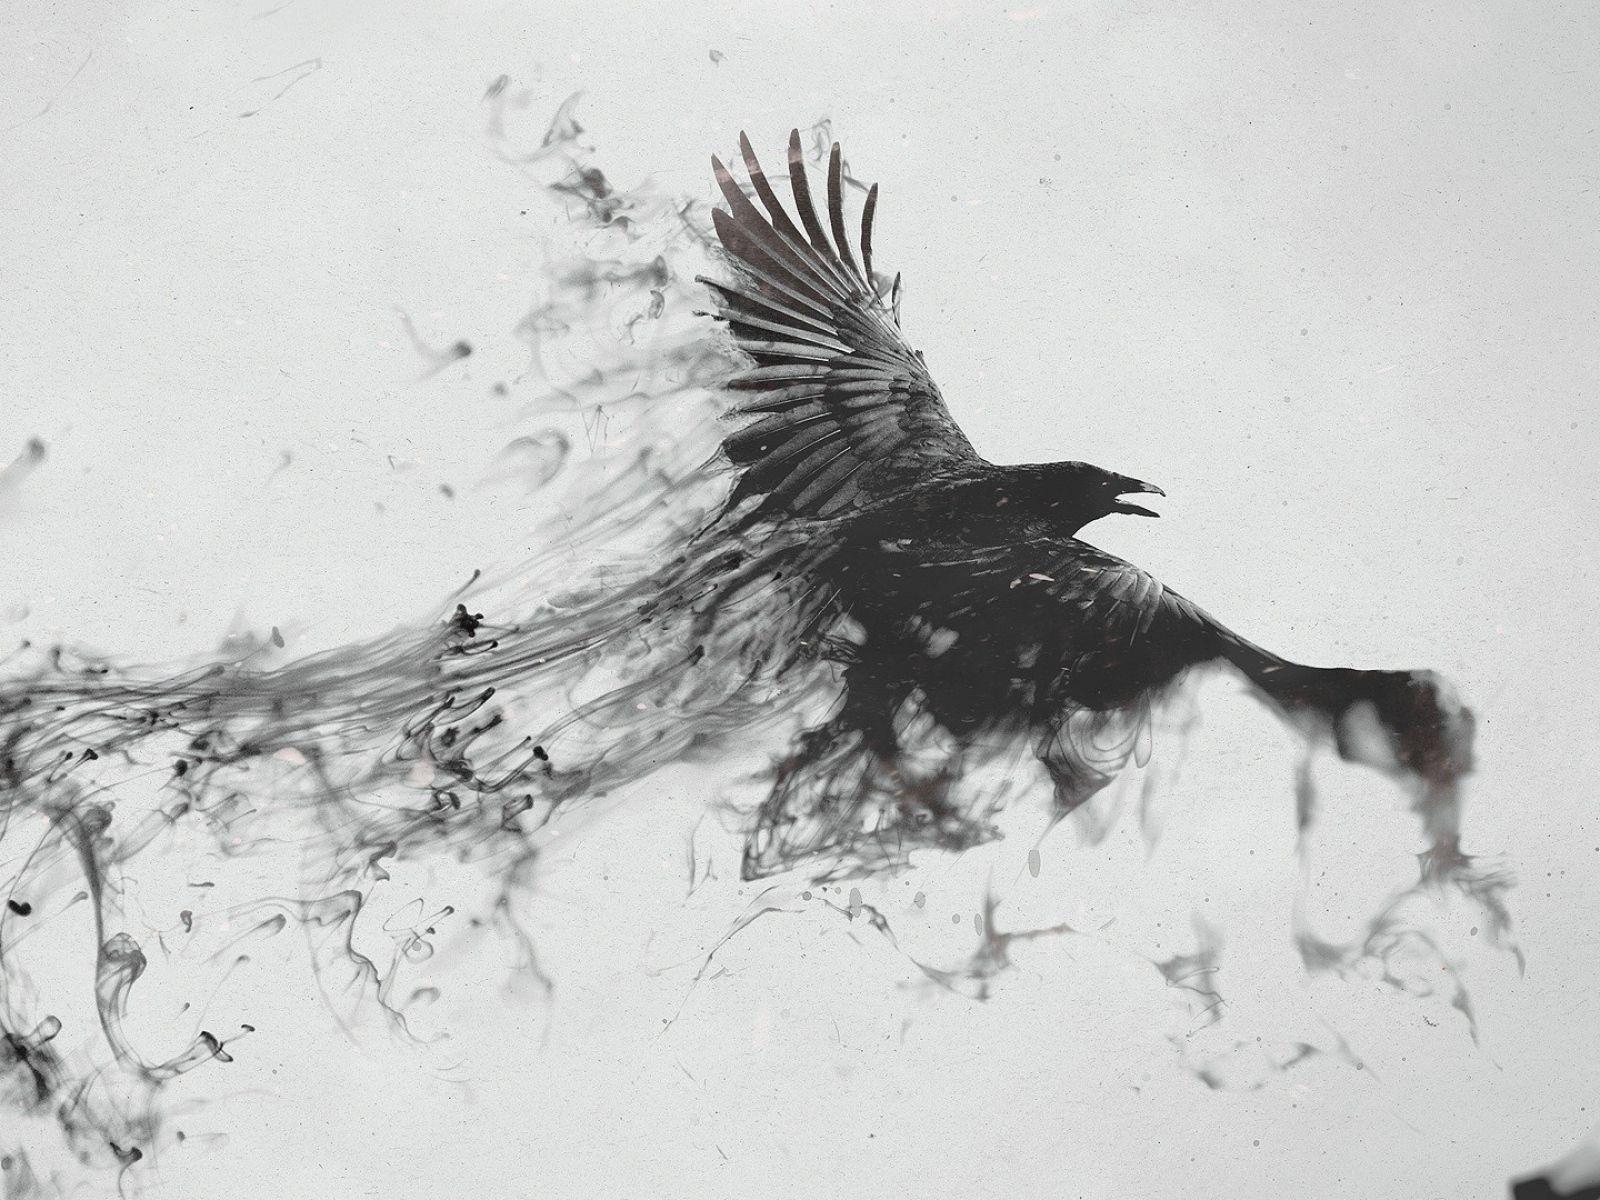 Download Wallpaper 1600x1200 Raven Bird Flying Smoke Black White 1600x1200 Hd Background Smoke Art Smoke Drawing Crow Tattoo